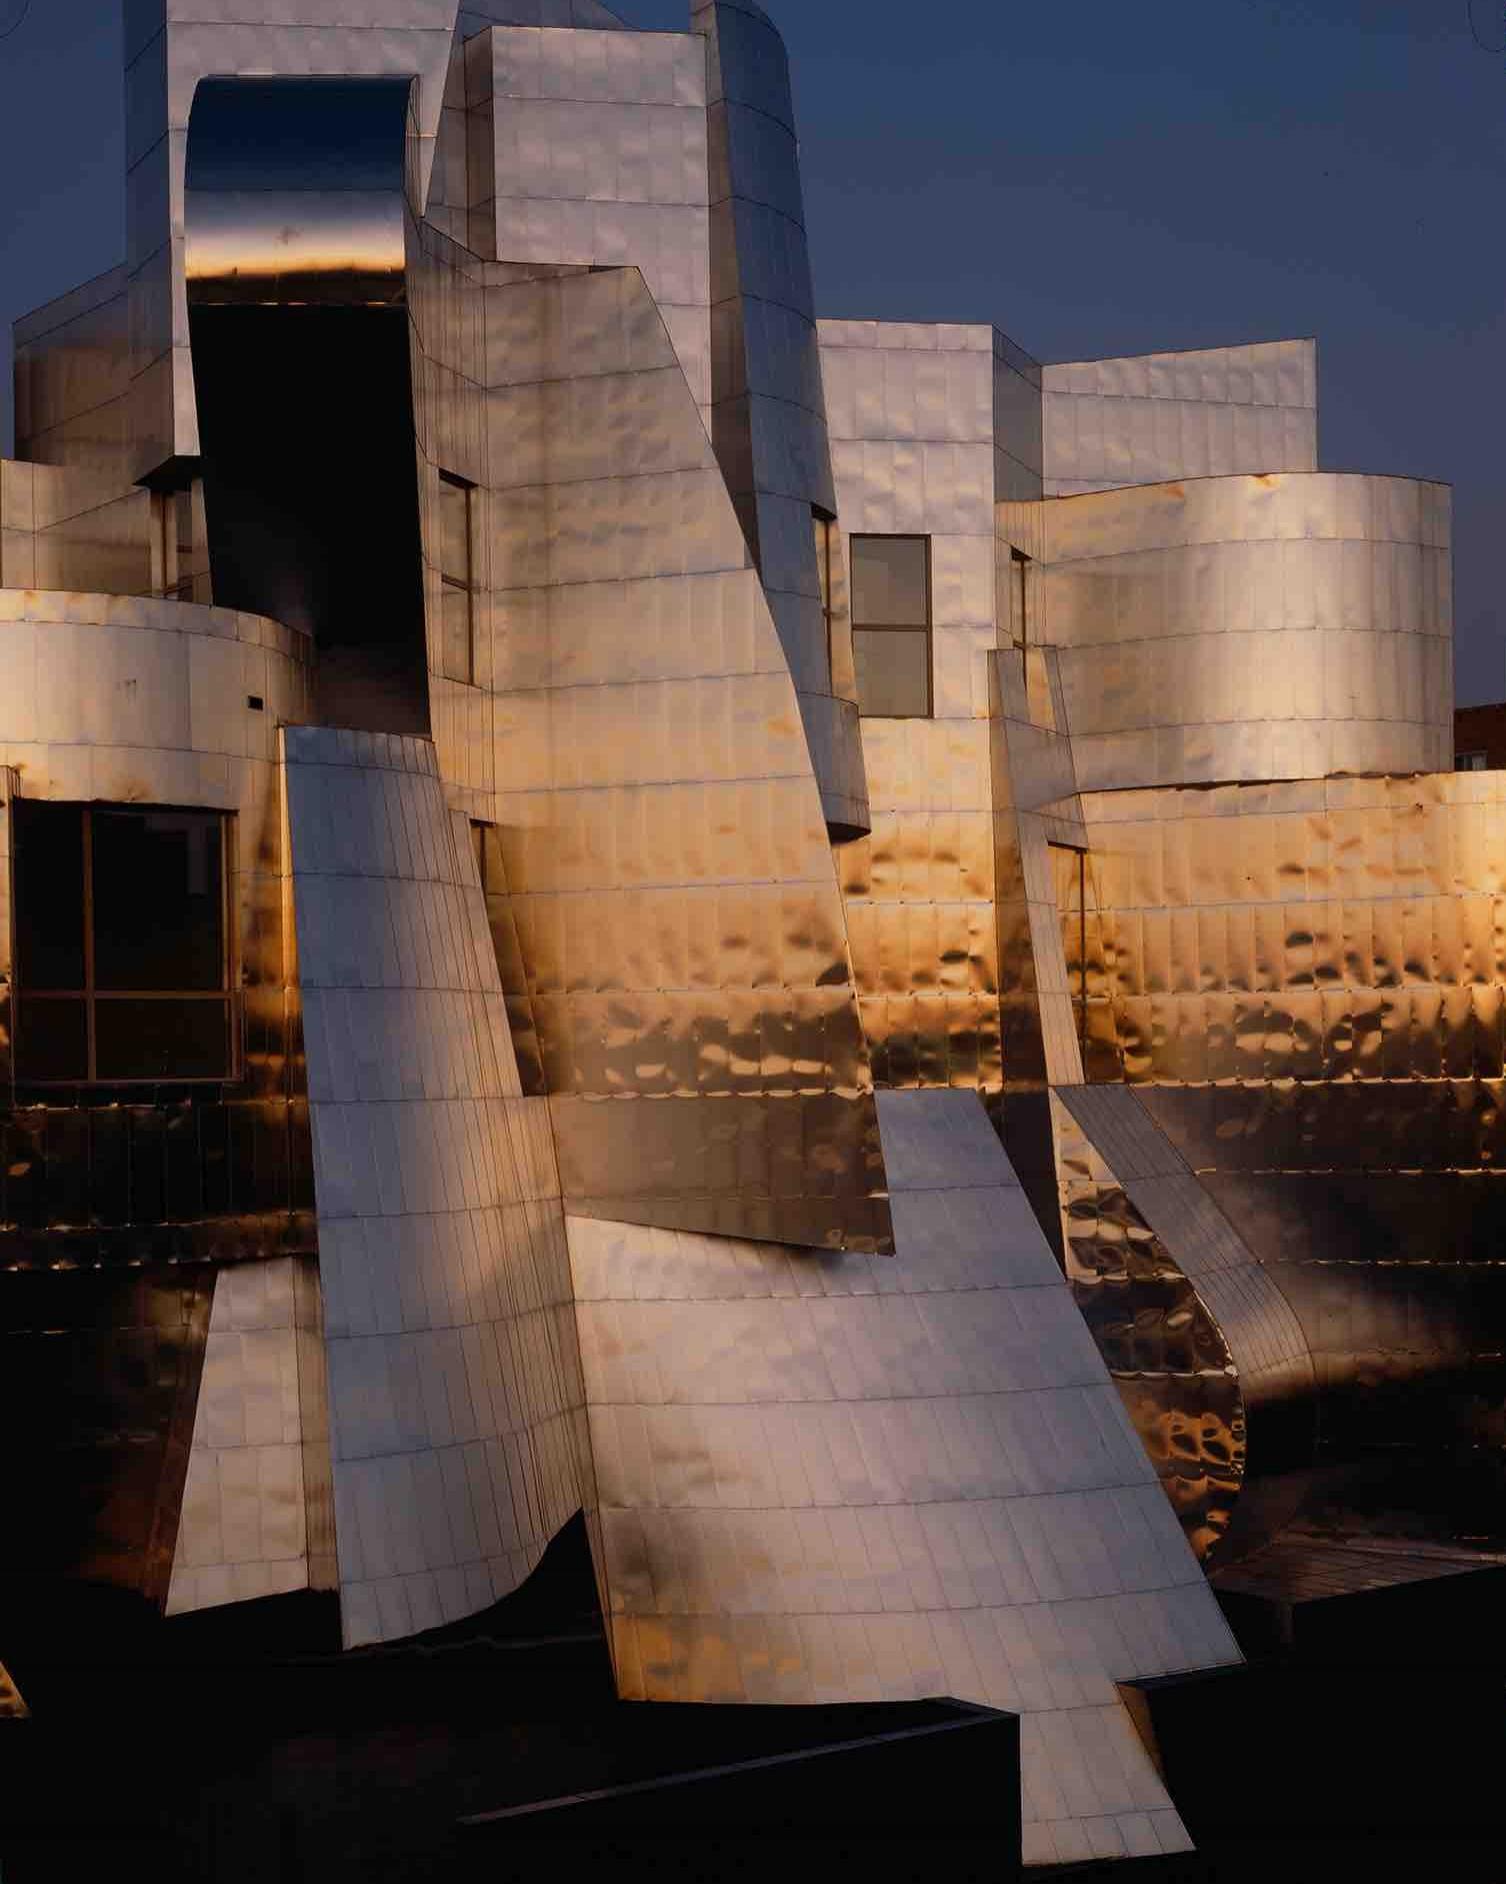 Frank Gehry, University of Minnesota, Frederick R. Weisman Museum (Minneapolis, MN) 1992